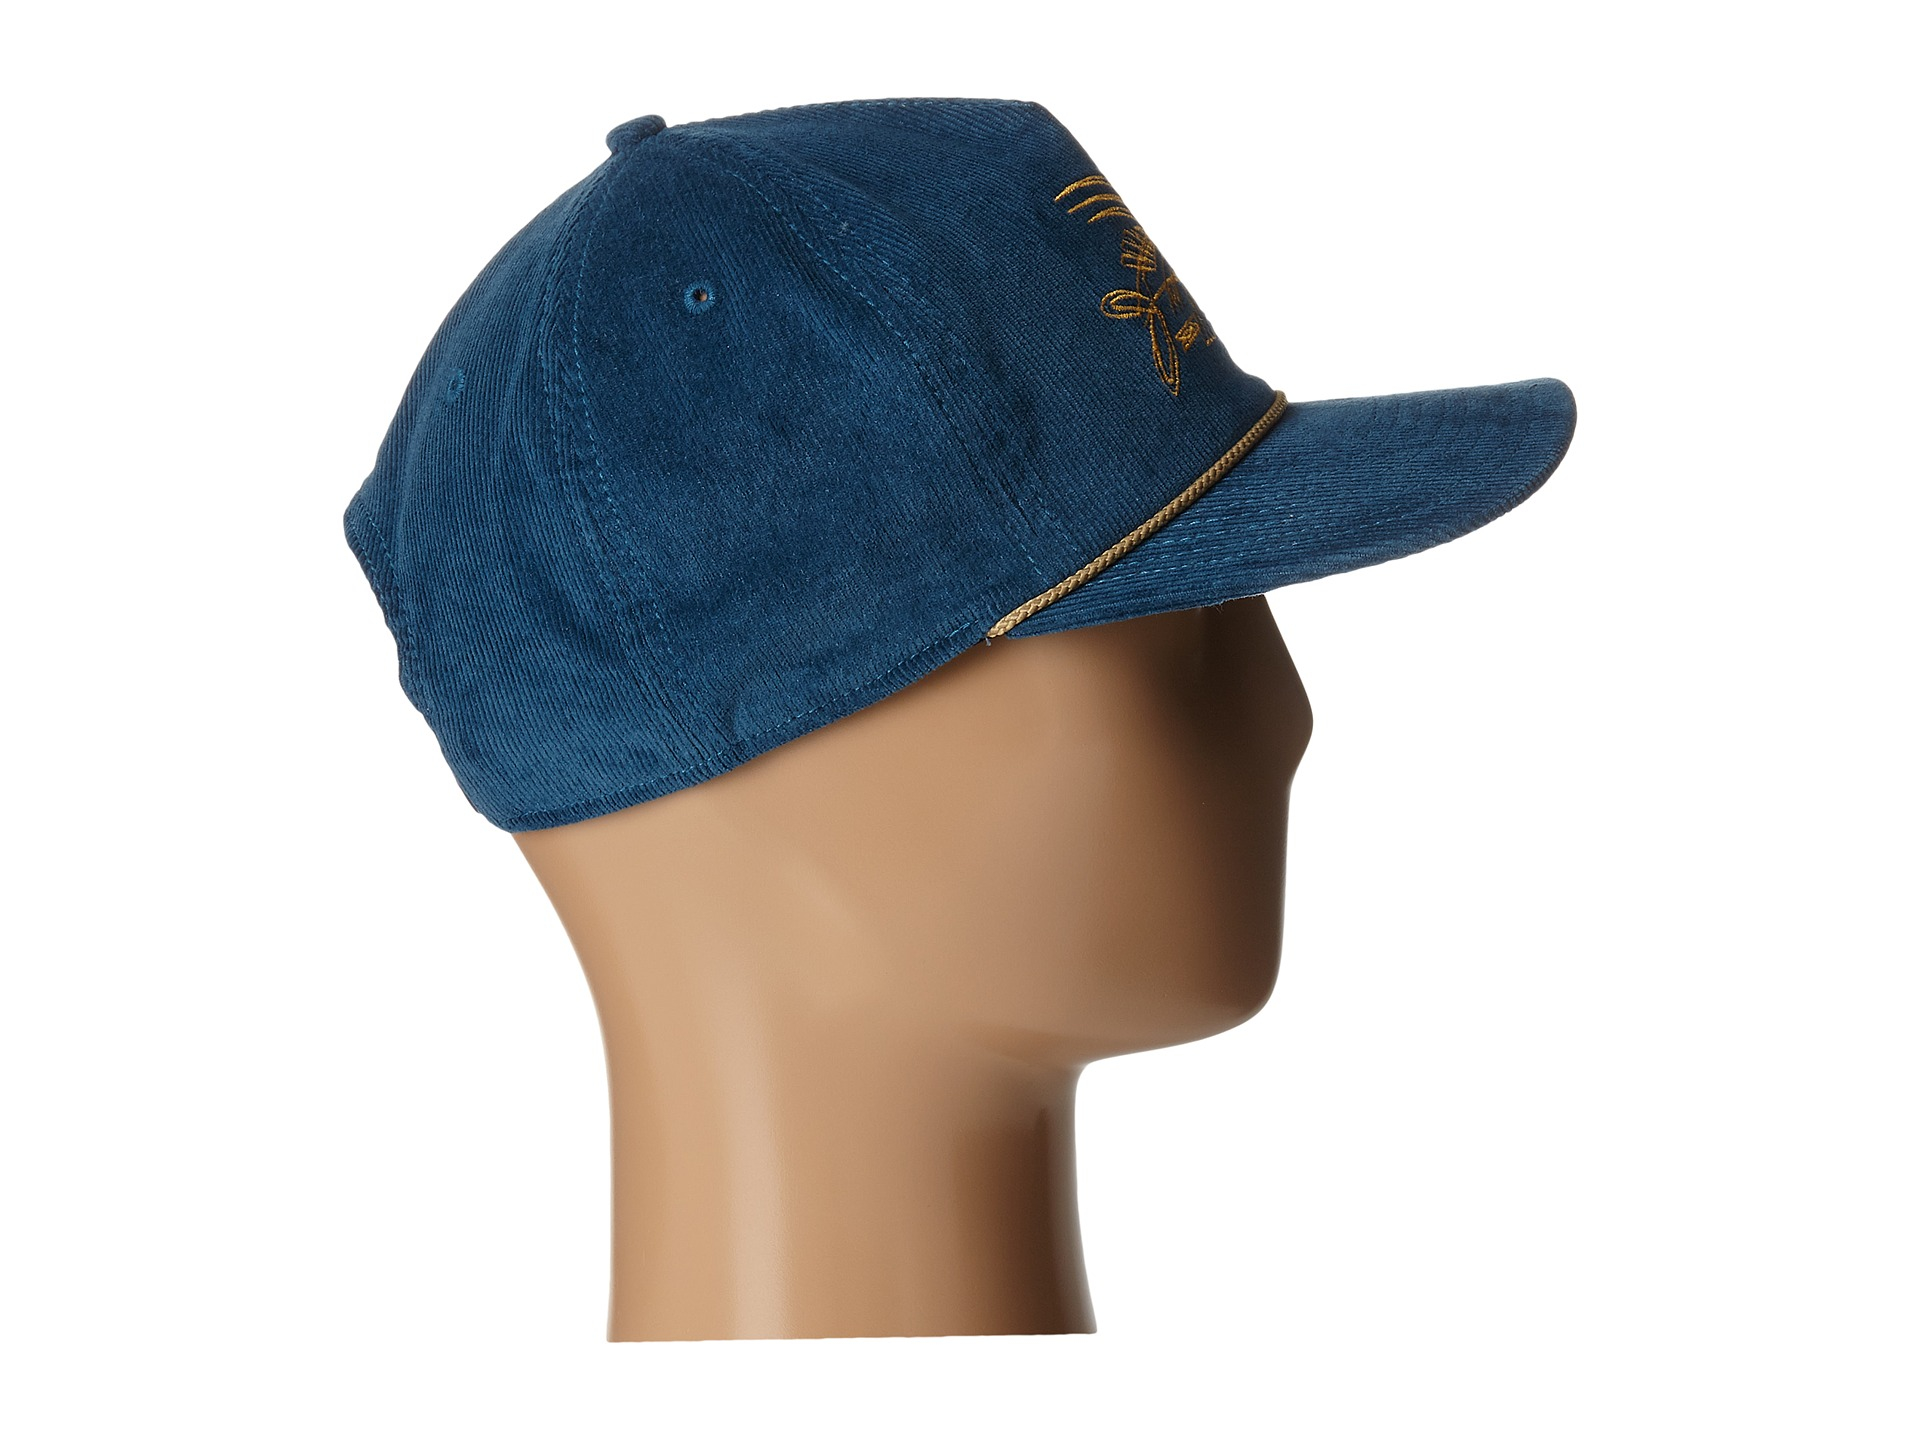 92274f990b2 Lyst - Patagonia Pinstripe Flying Fish Corduroy Hat in Blue